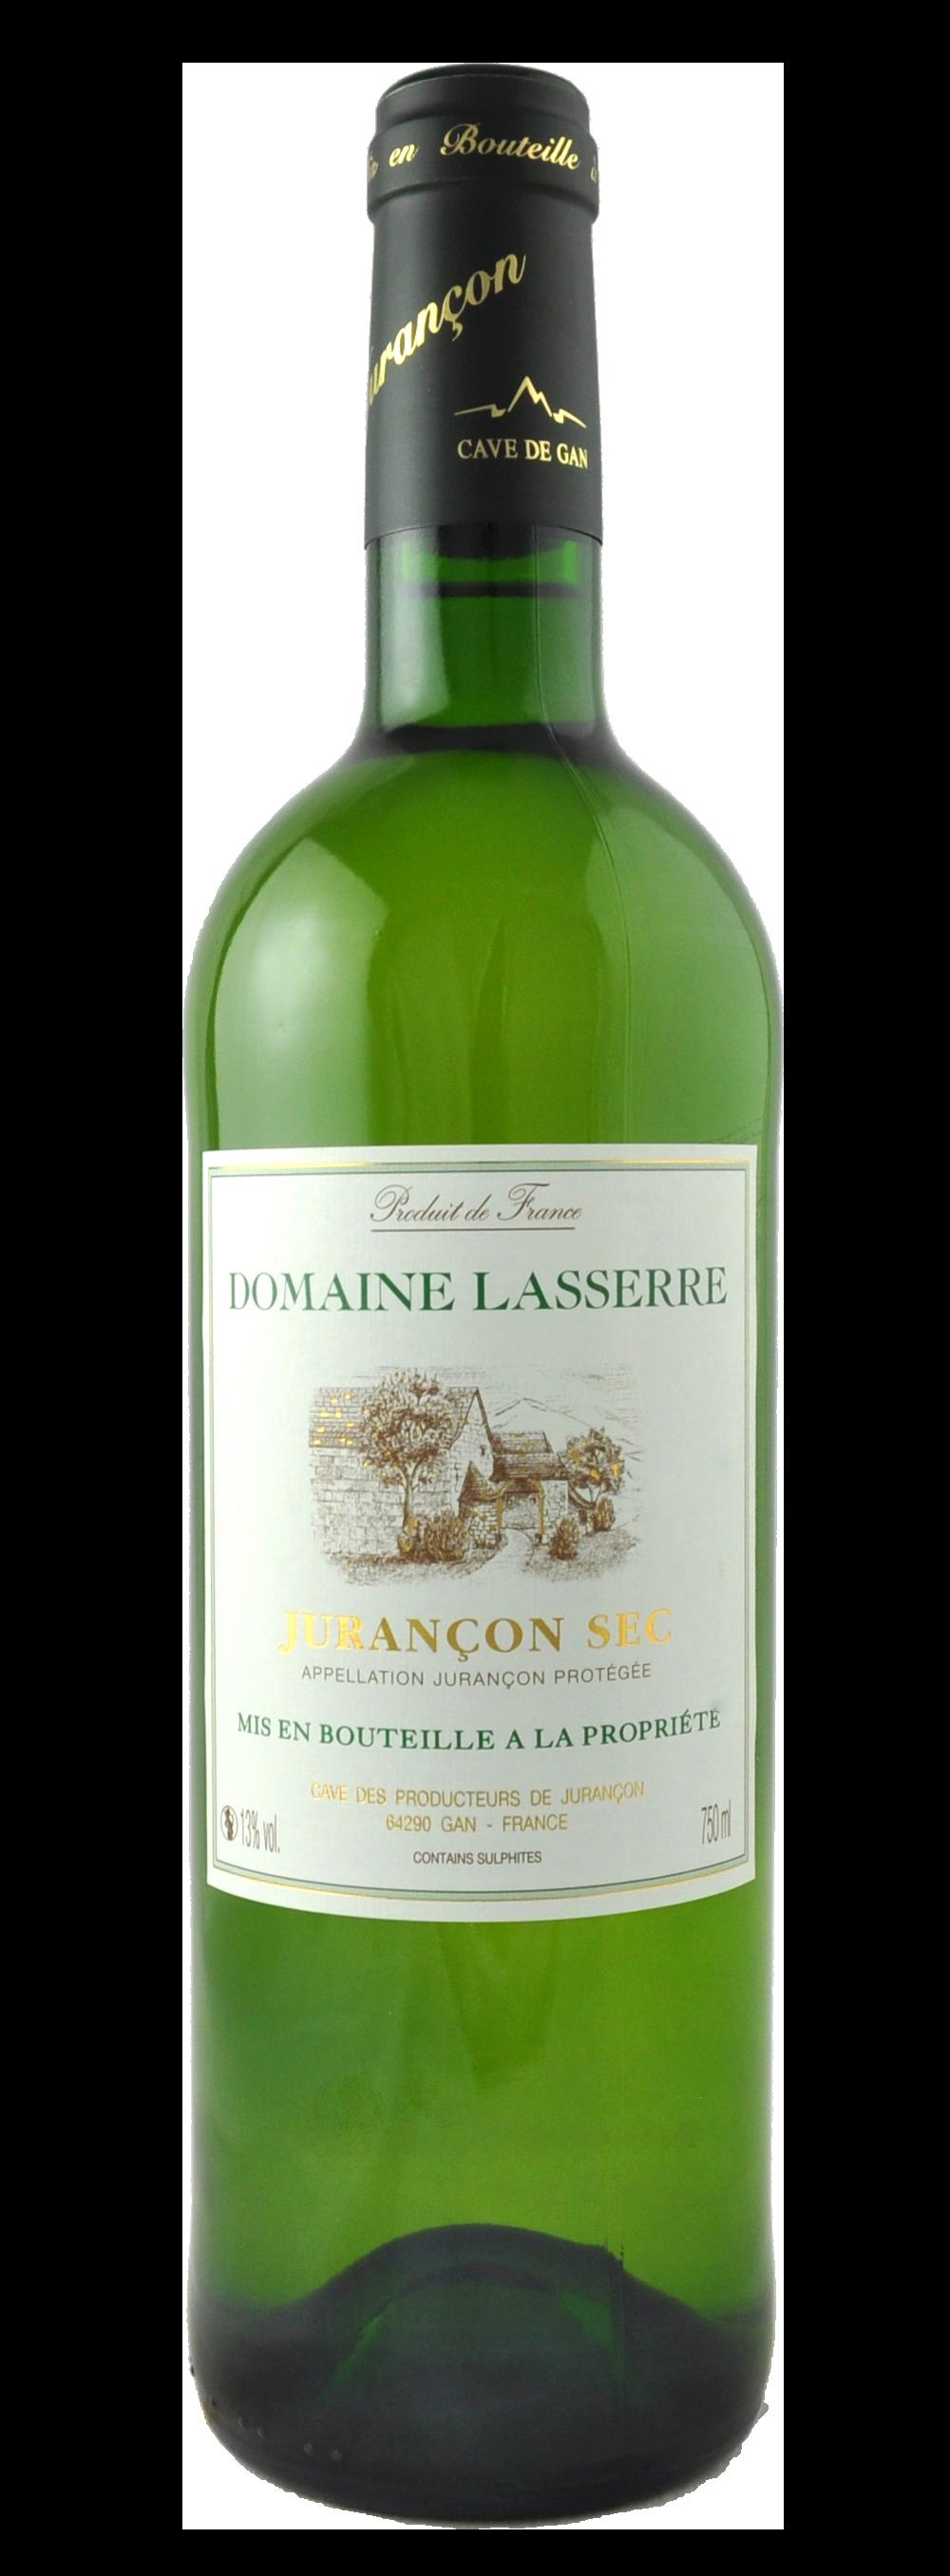 Domaine Lasserre sec 2017 (75cl)